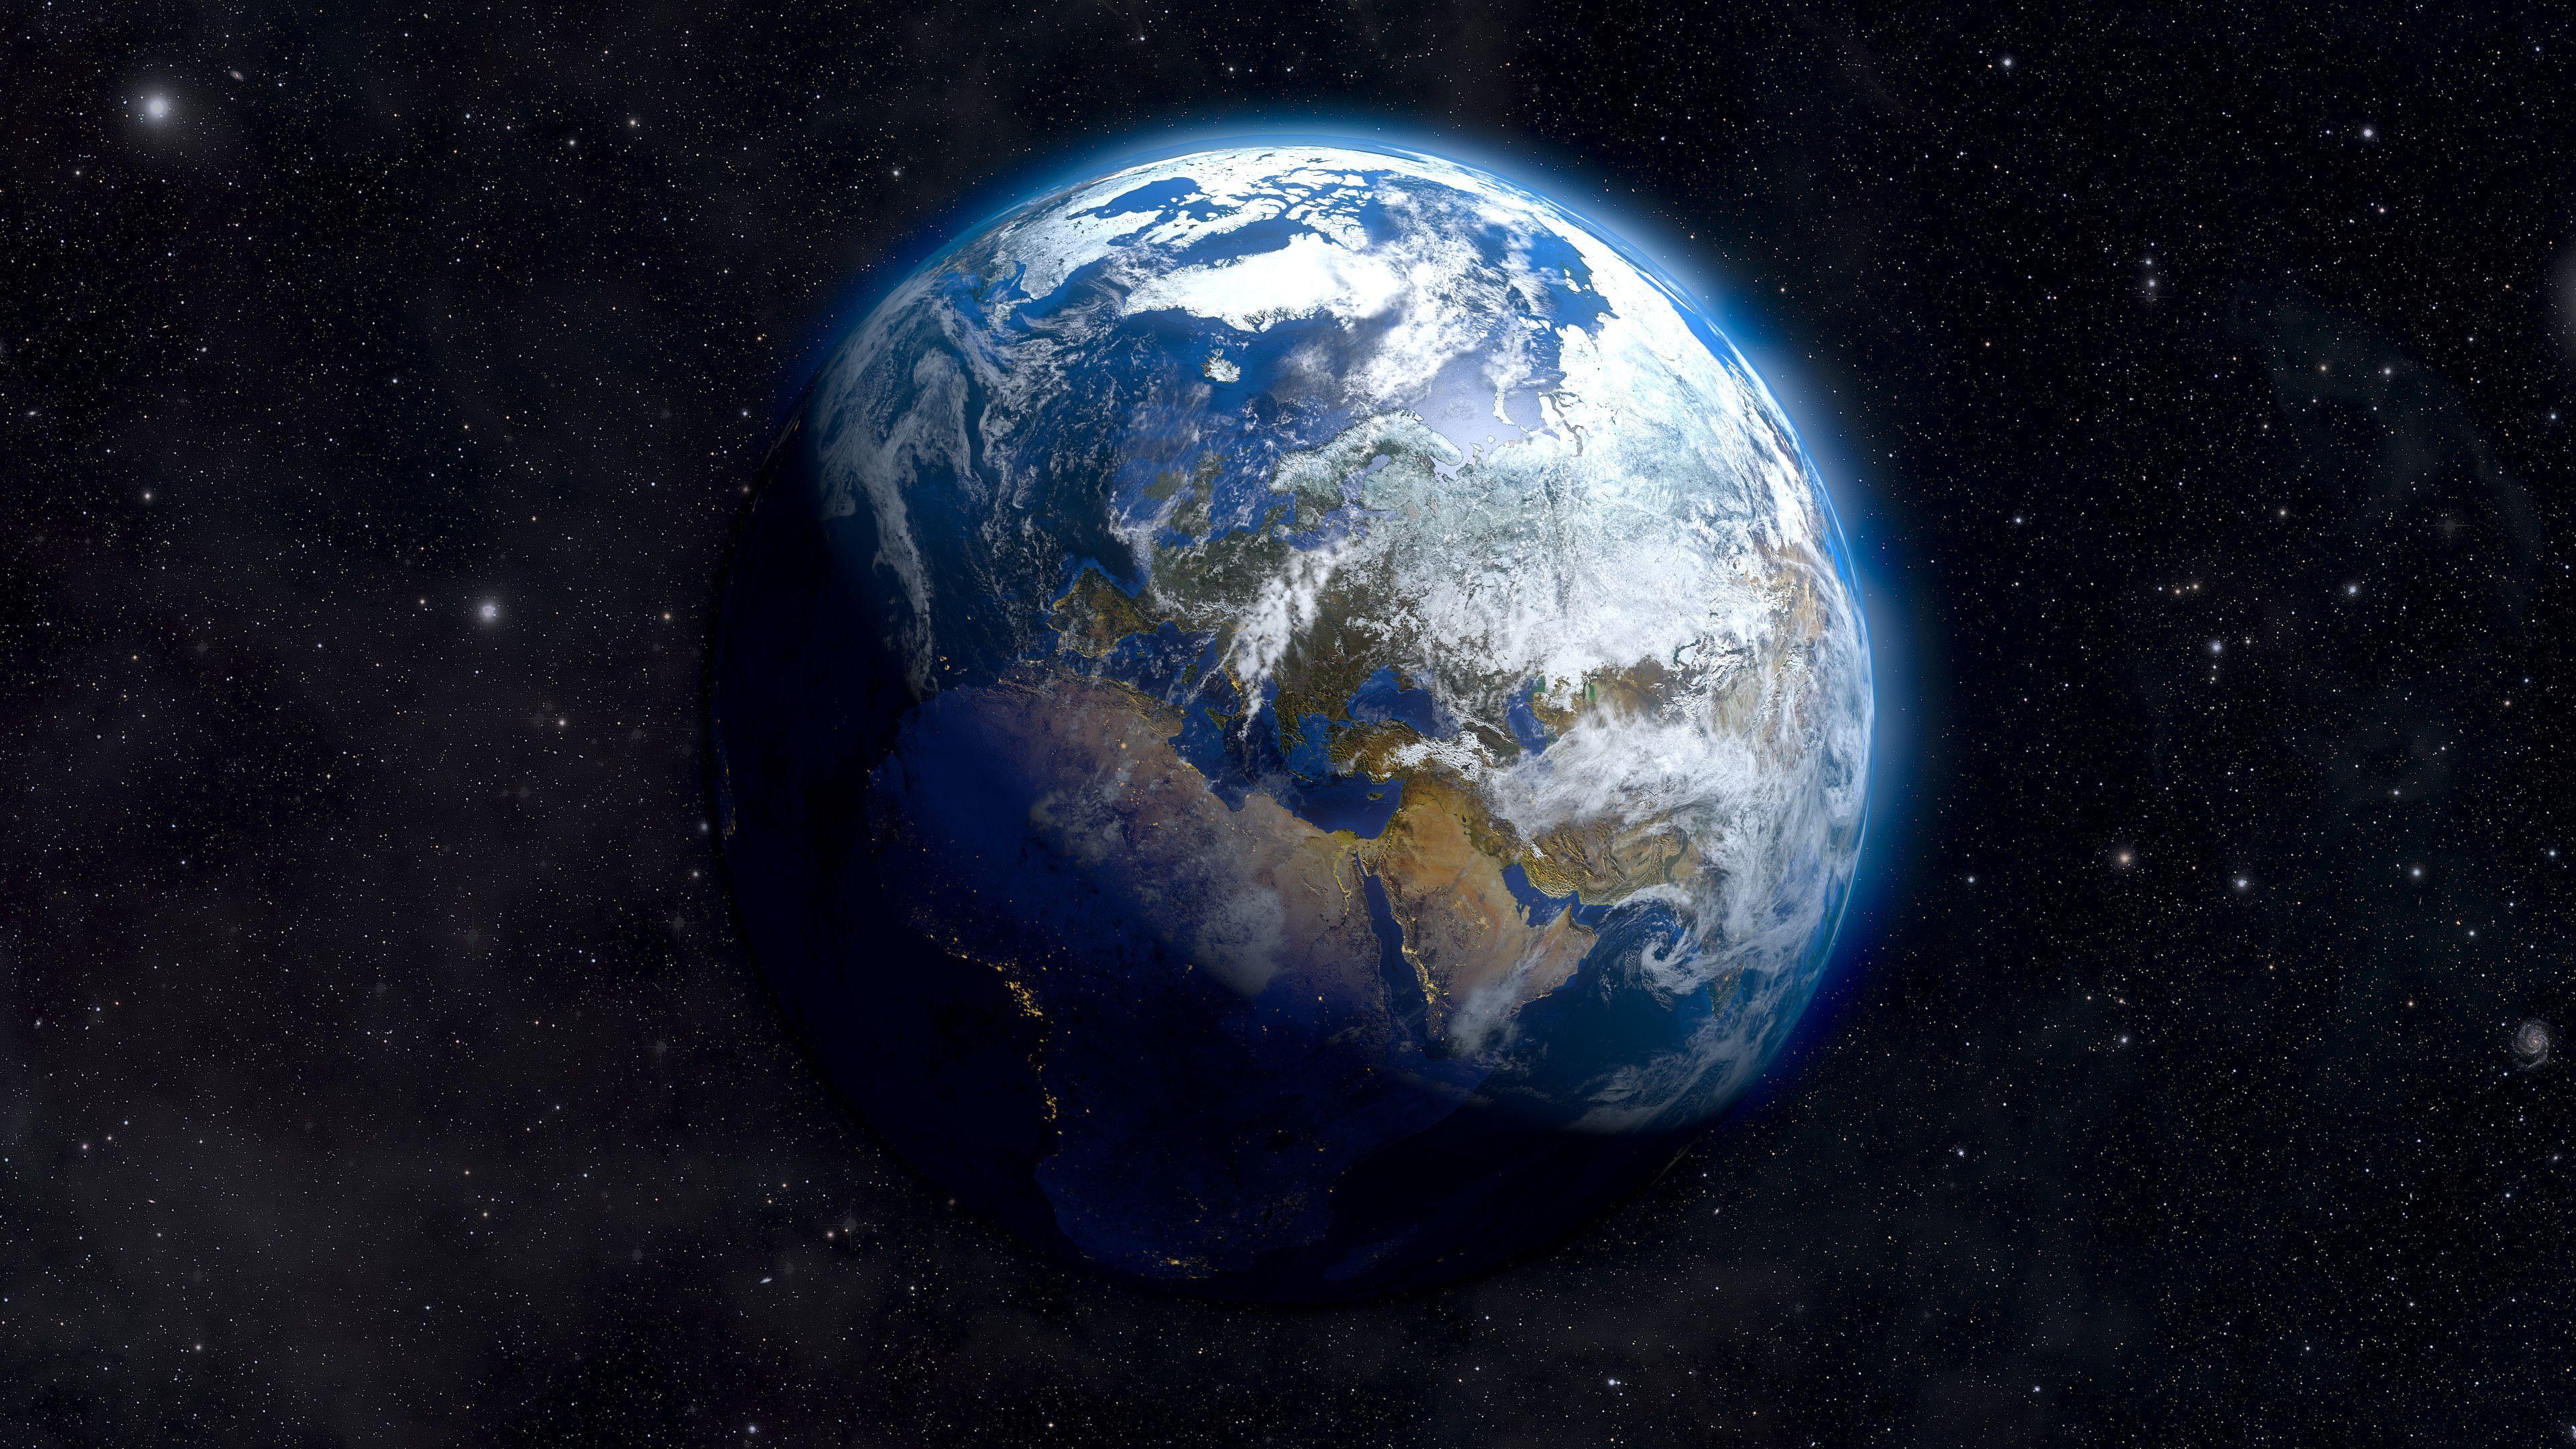 4k Earth Wallpapers Top Free 4k Earth Backgrounds Wallpaperaccess Wallpaper Earth Iphone Wallpaper Earth Background Hd Wallpaper